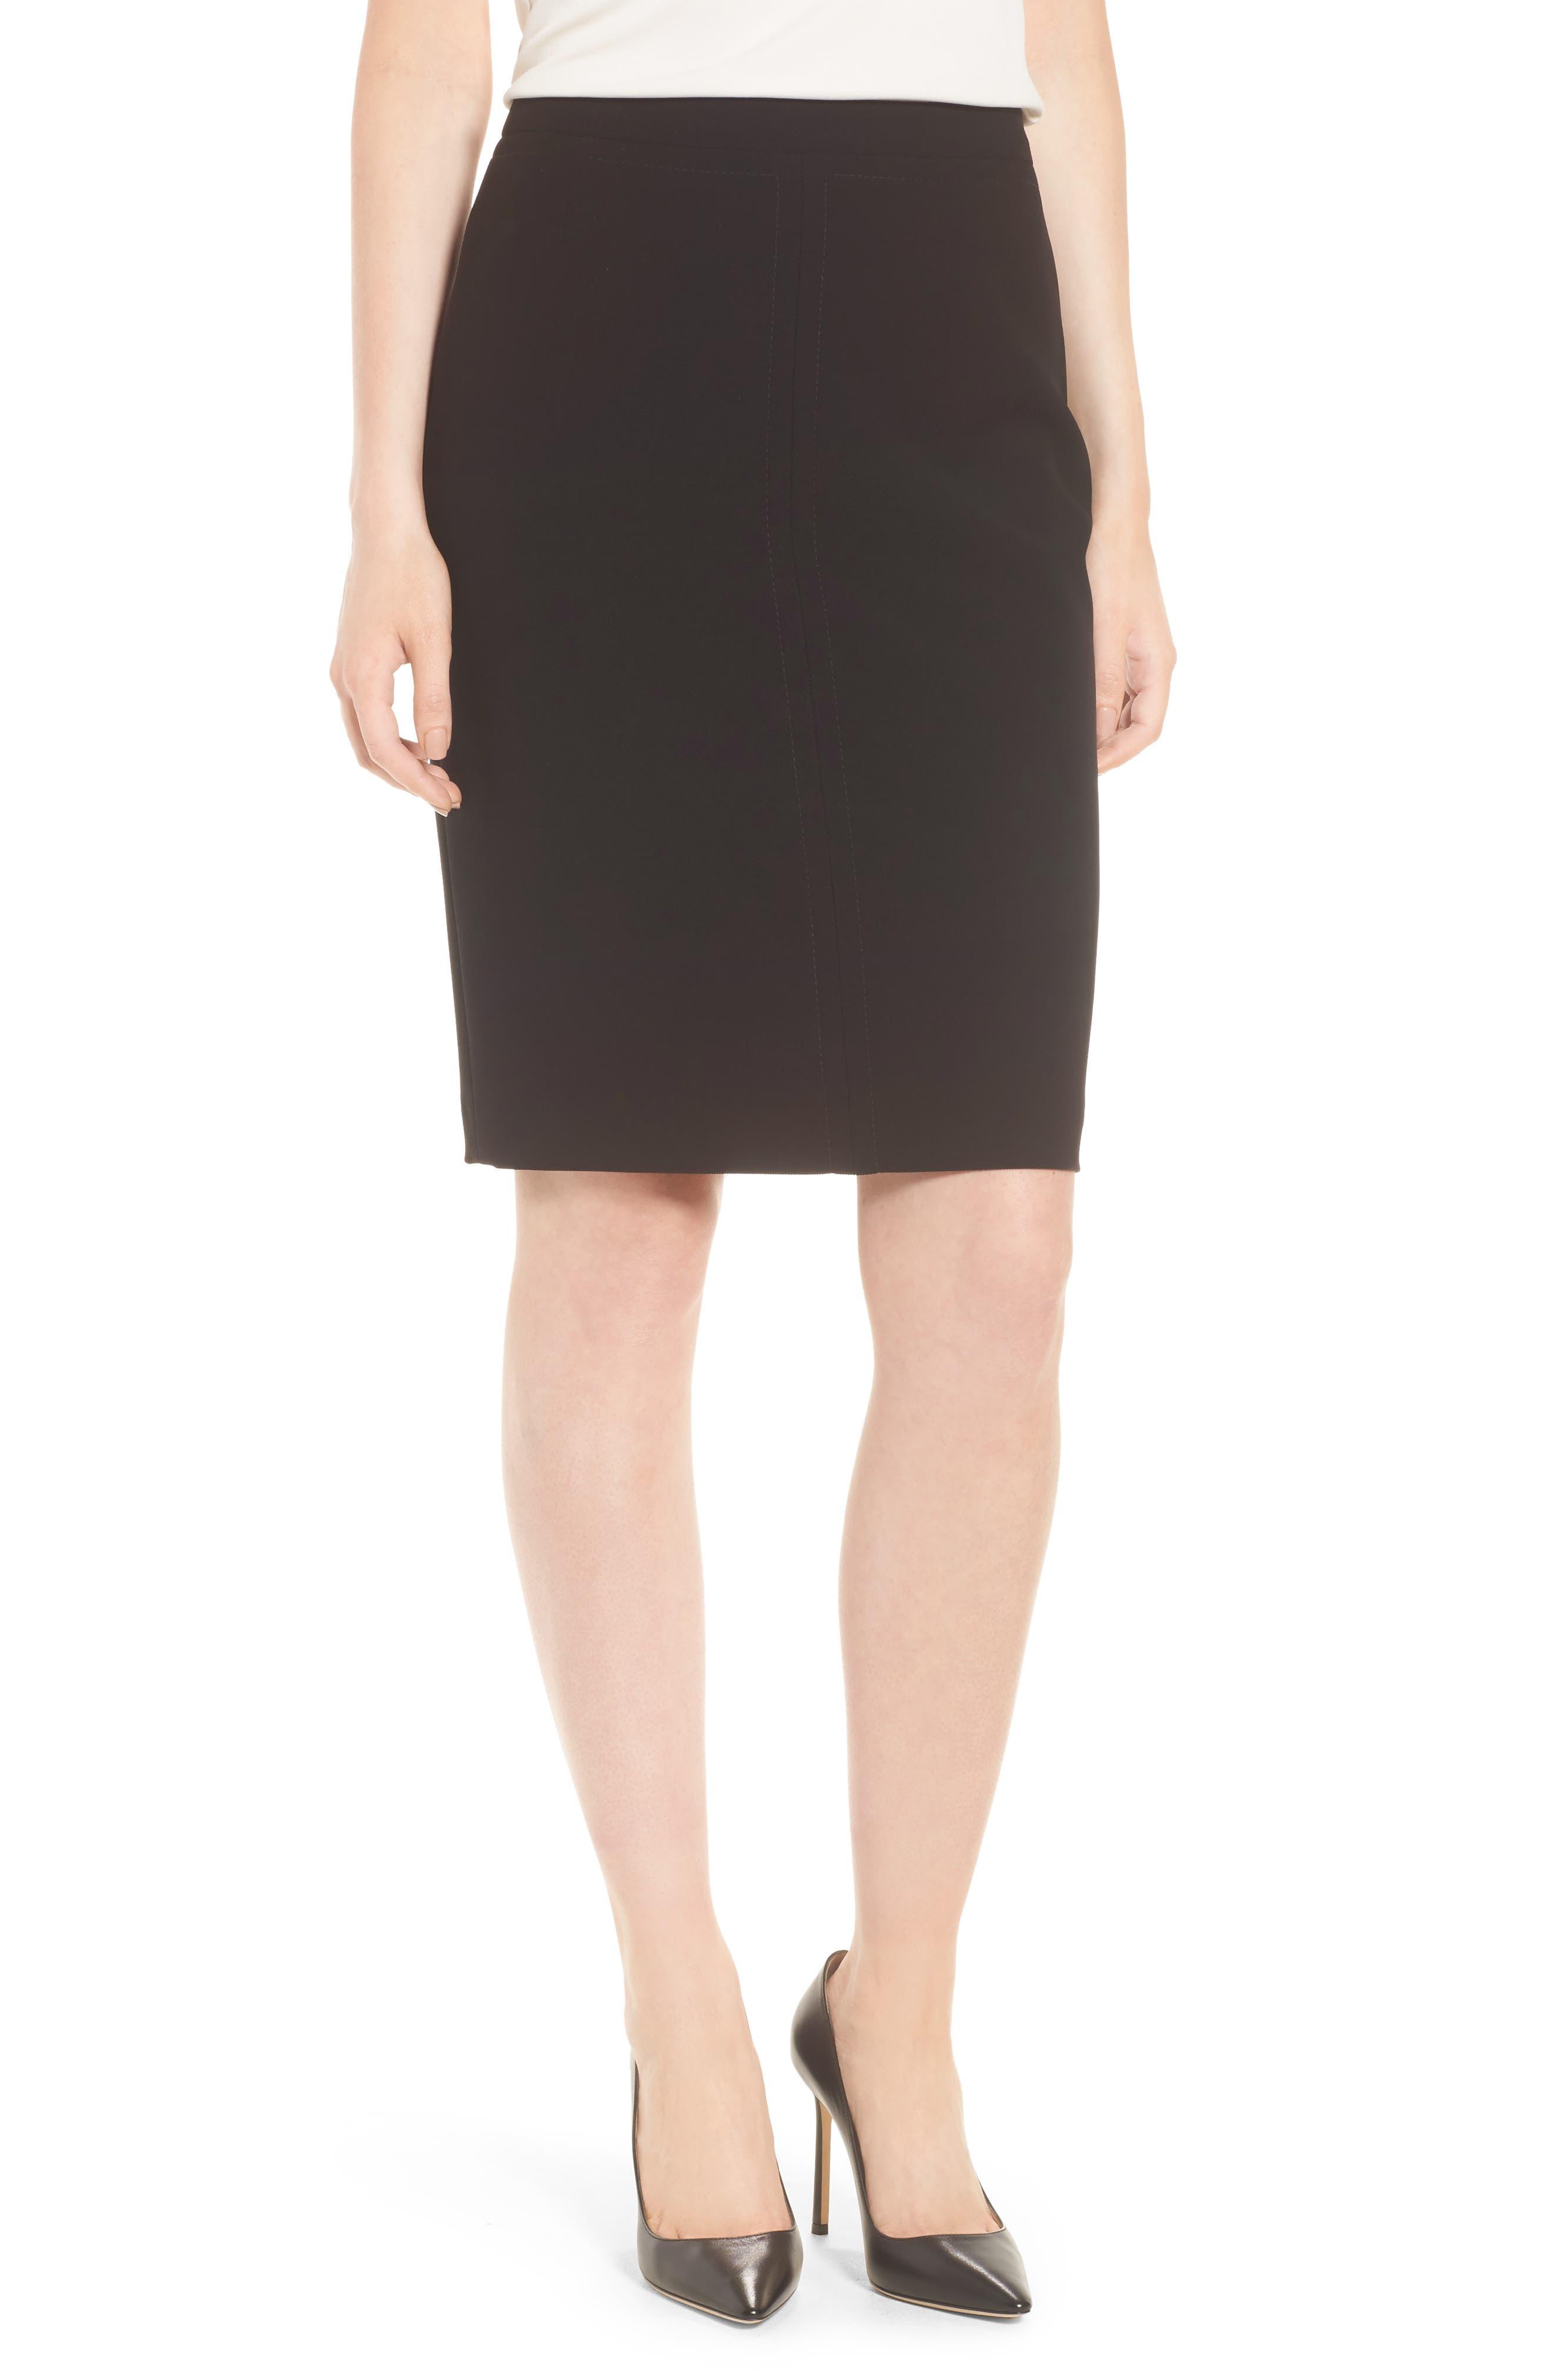 Vuriona Pencil Skirt,                         Main,                         color, 001